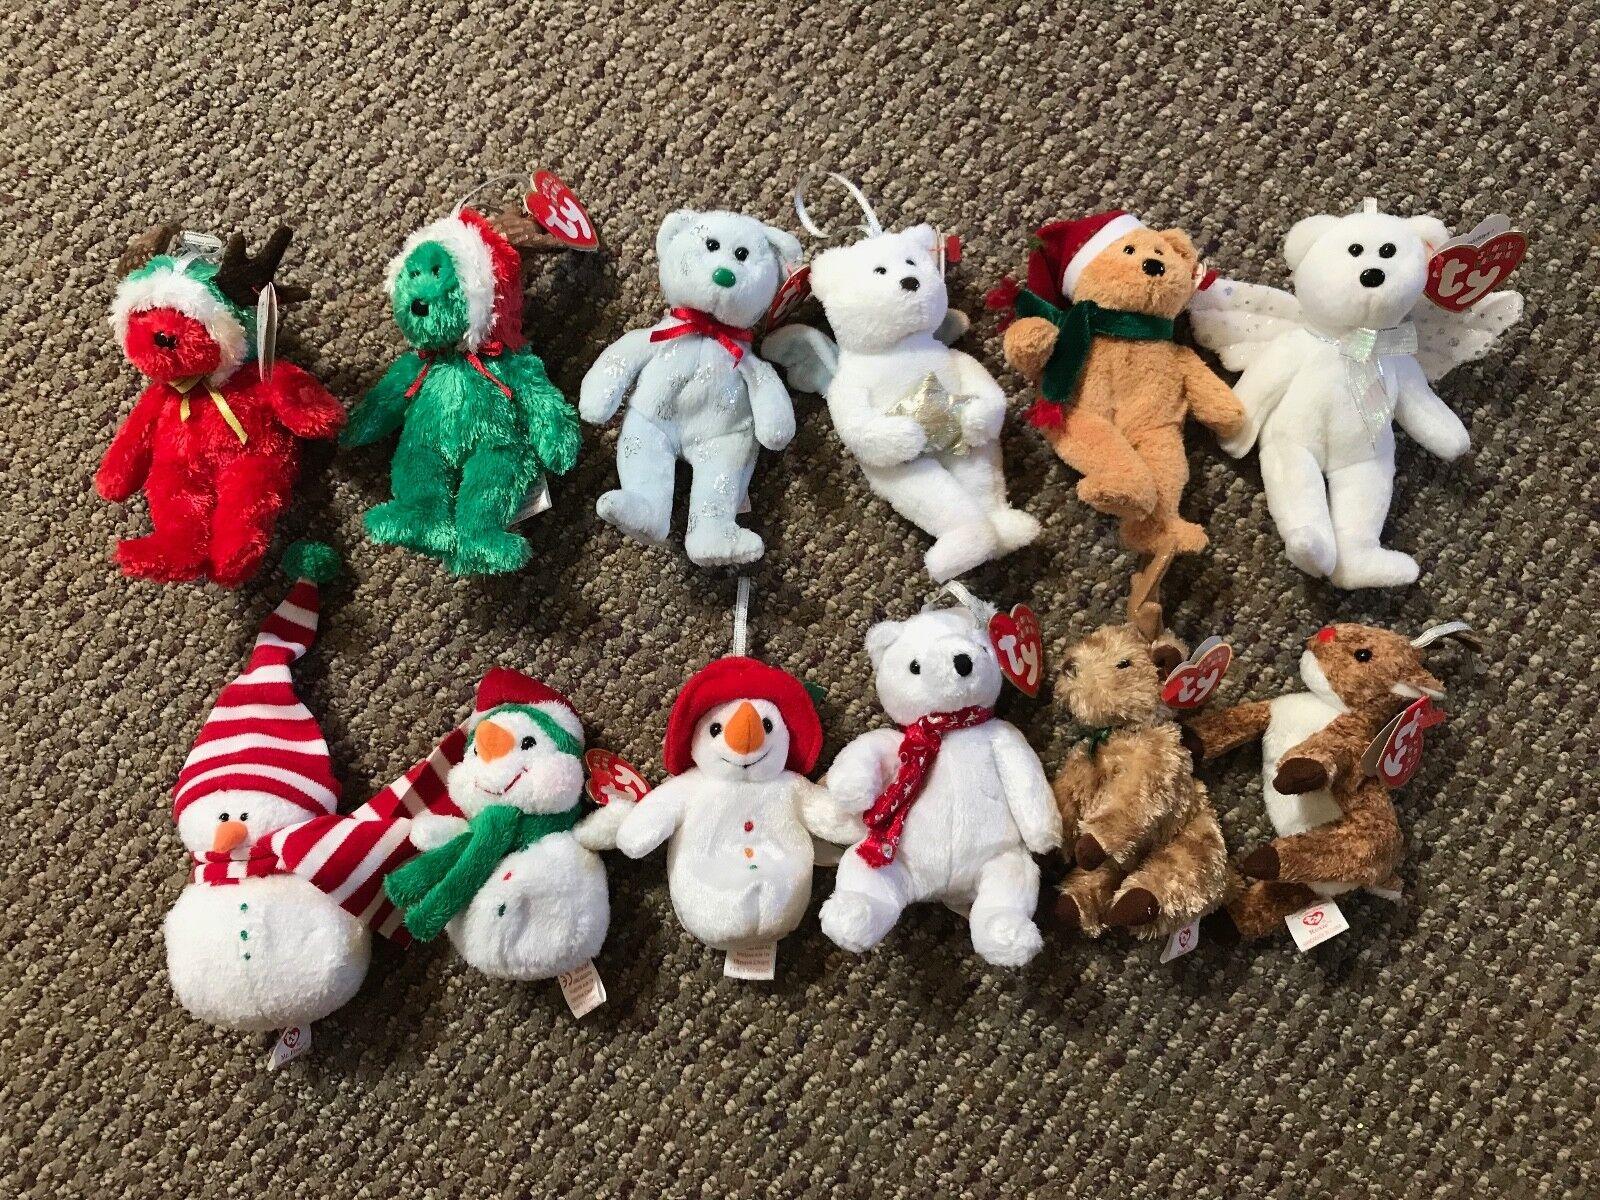 Ty beanie babys jingle beanies ornamente 28 gemeinden festgelegten 12  trägt.